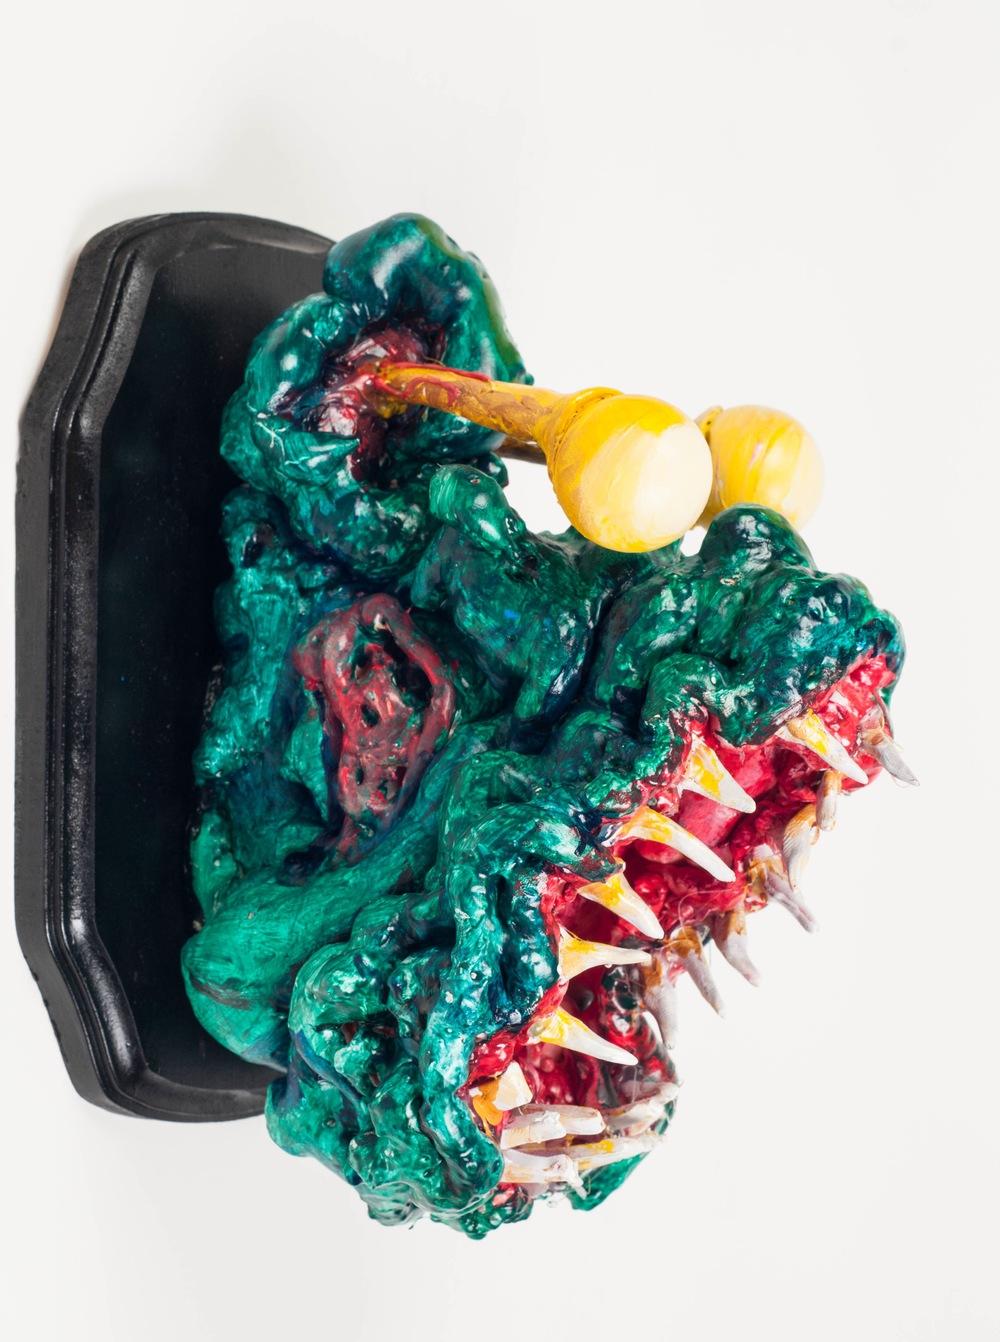 Bobby Cilantro Sculptures 01.10.15 (15 of 117).jpg